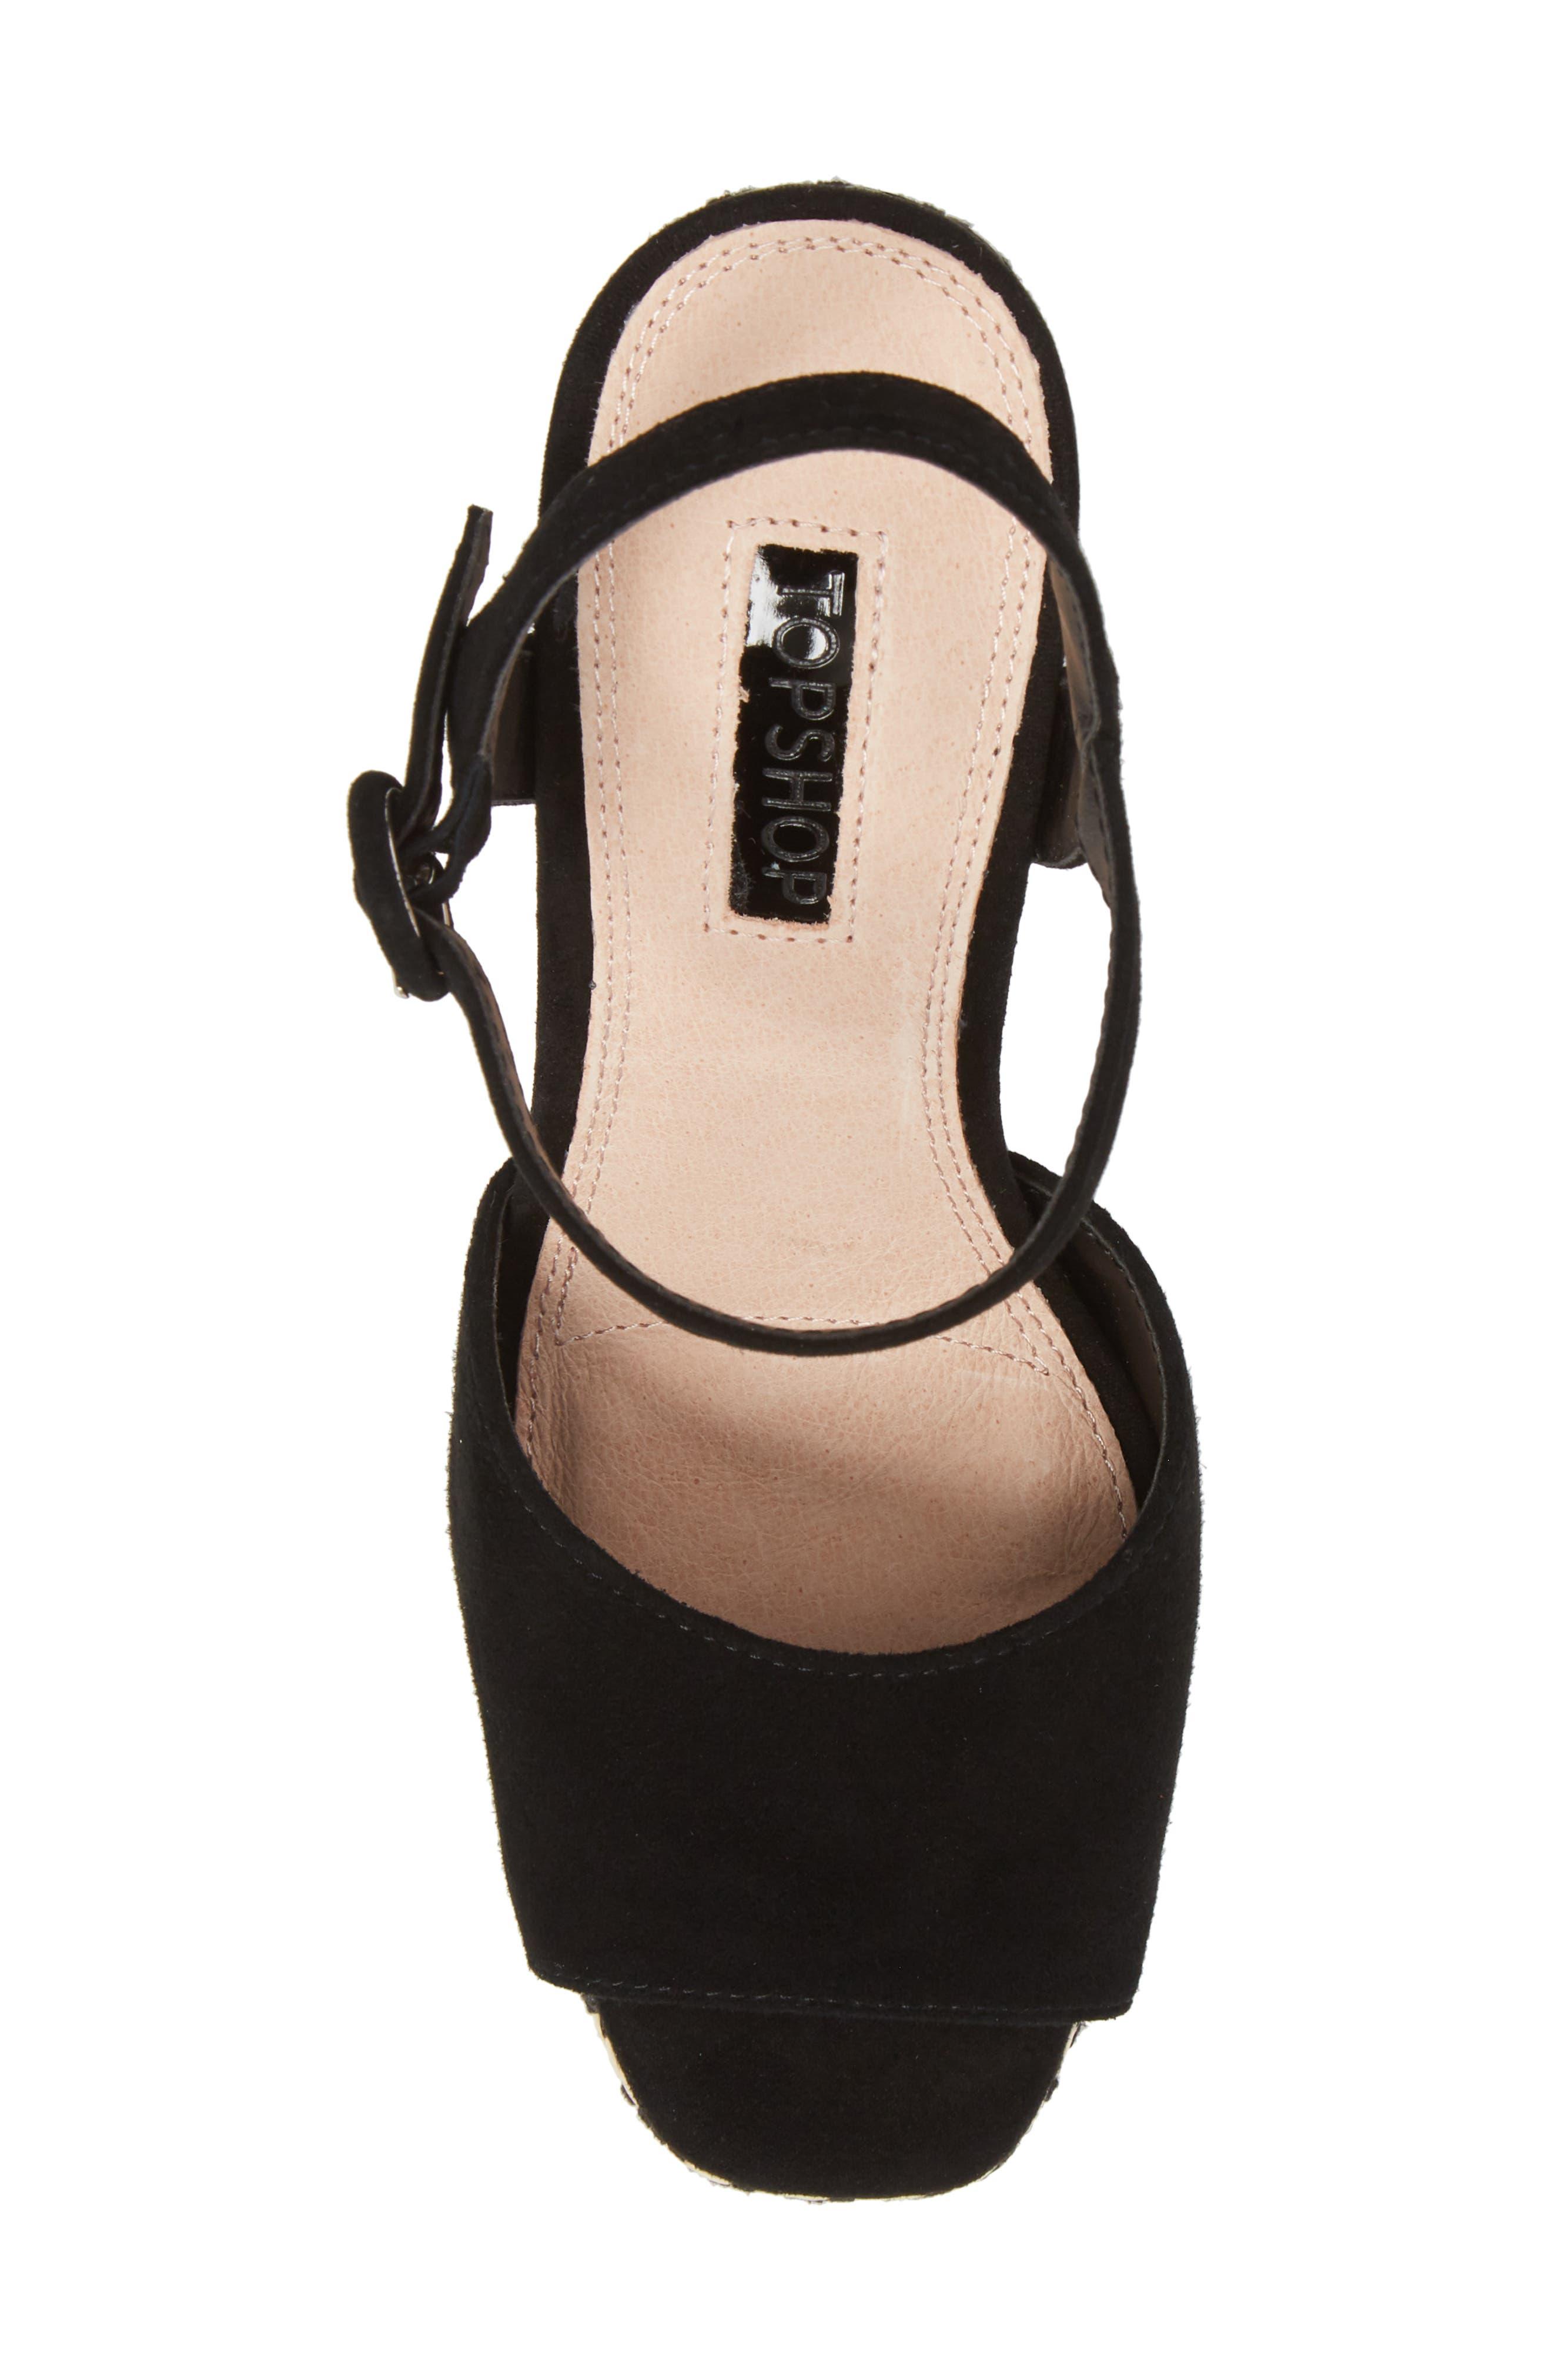 Laura Woven Block Heel Sandal,                             Alternate thumbnail 5, color,                             Black Multi